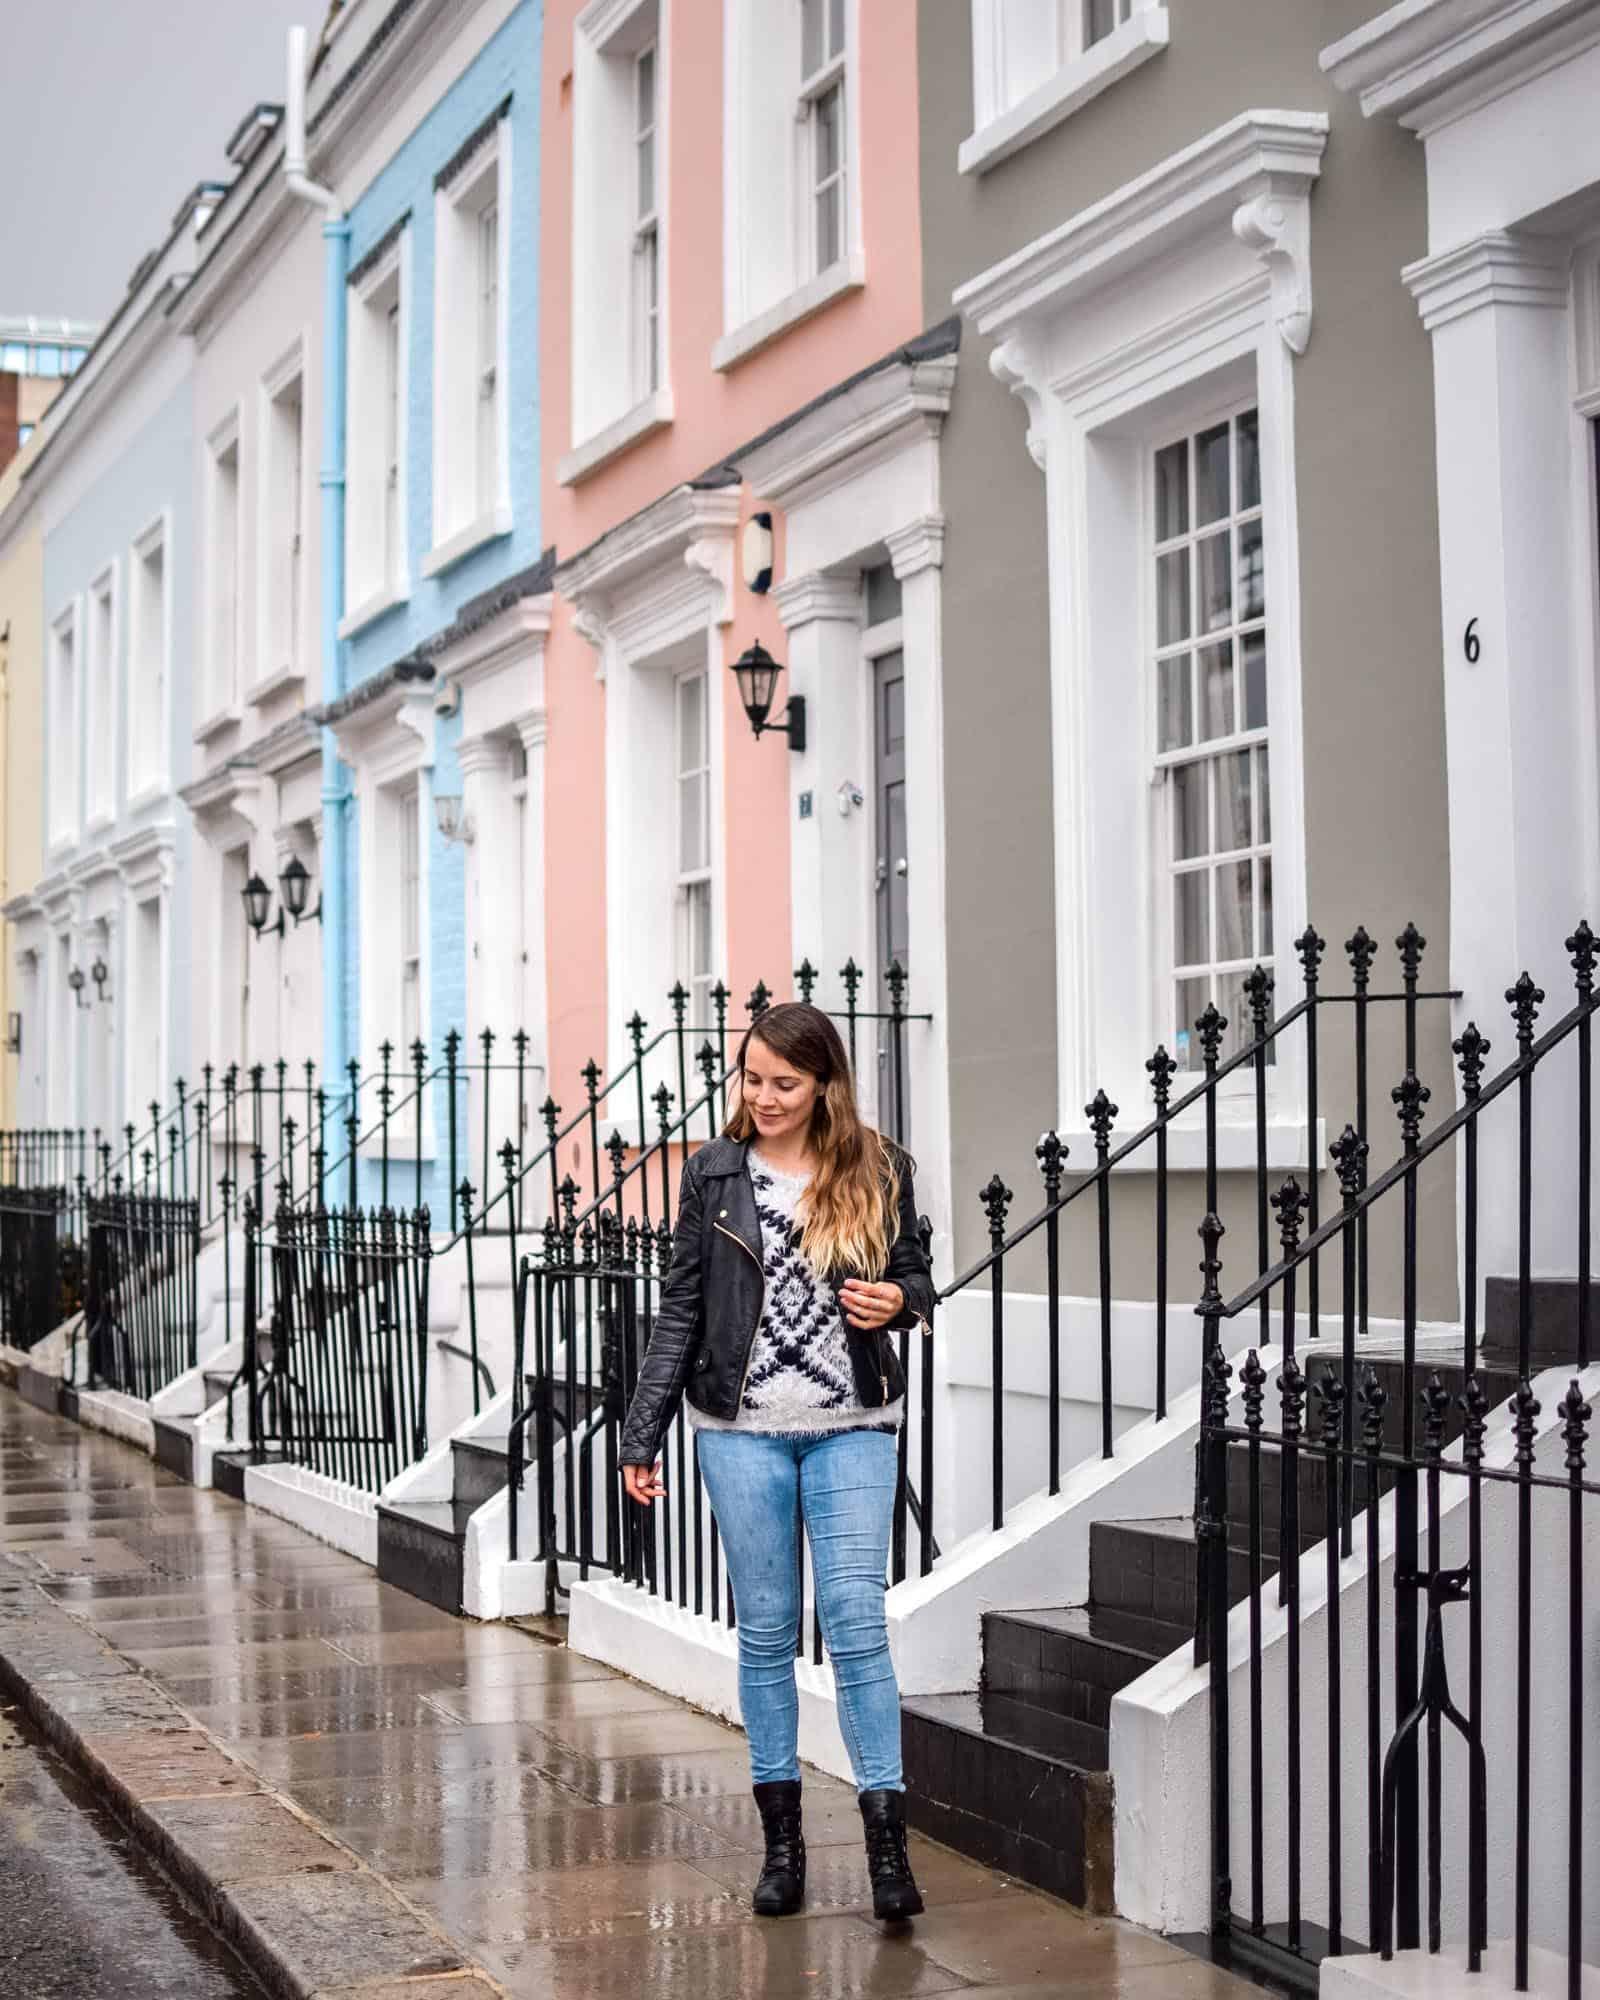 Calcott Street Notting Hill on a rainy day